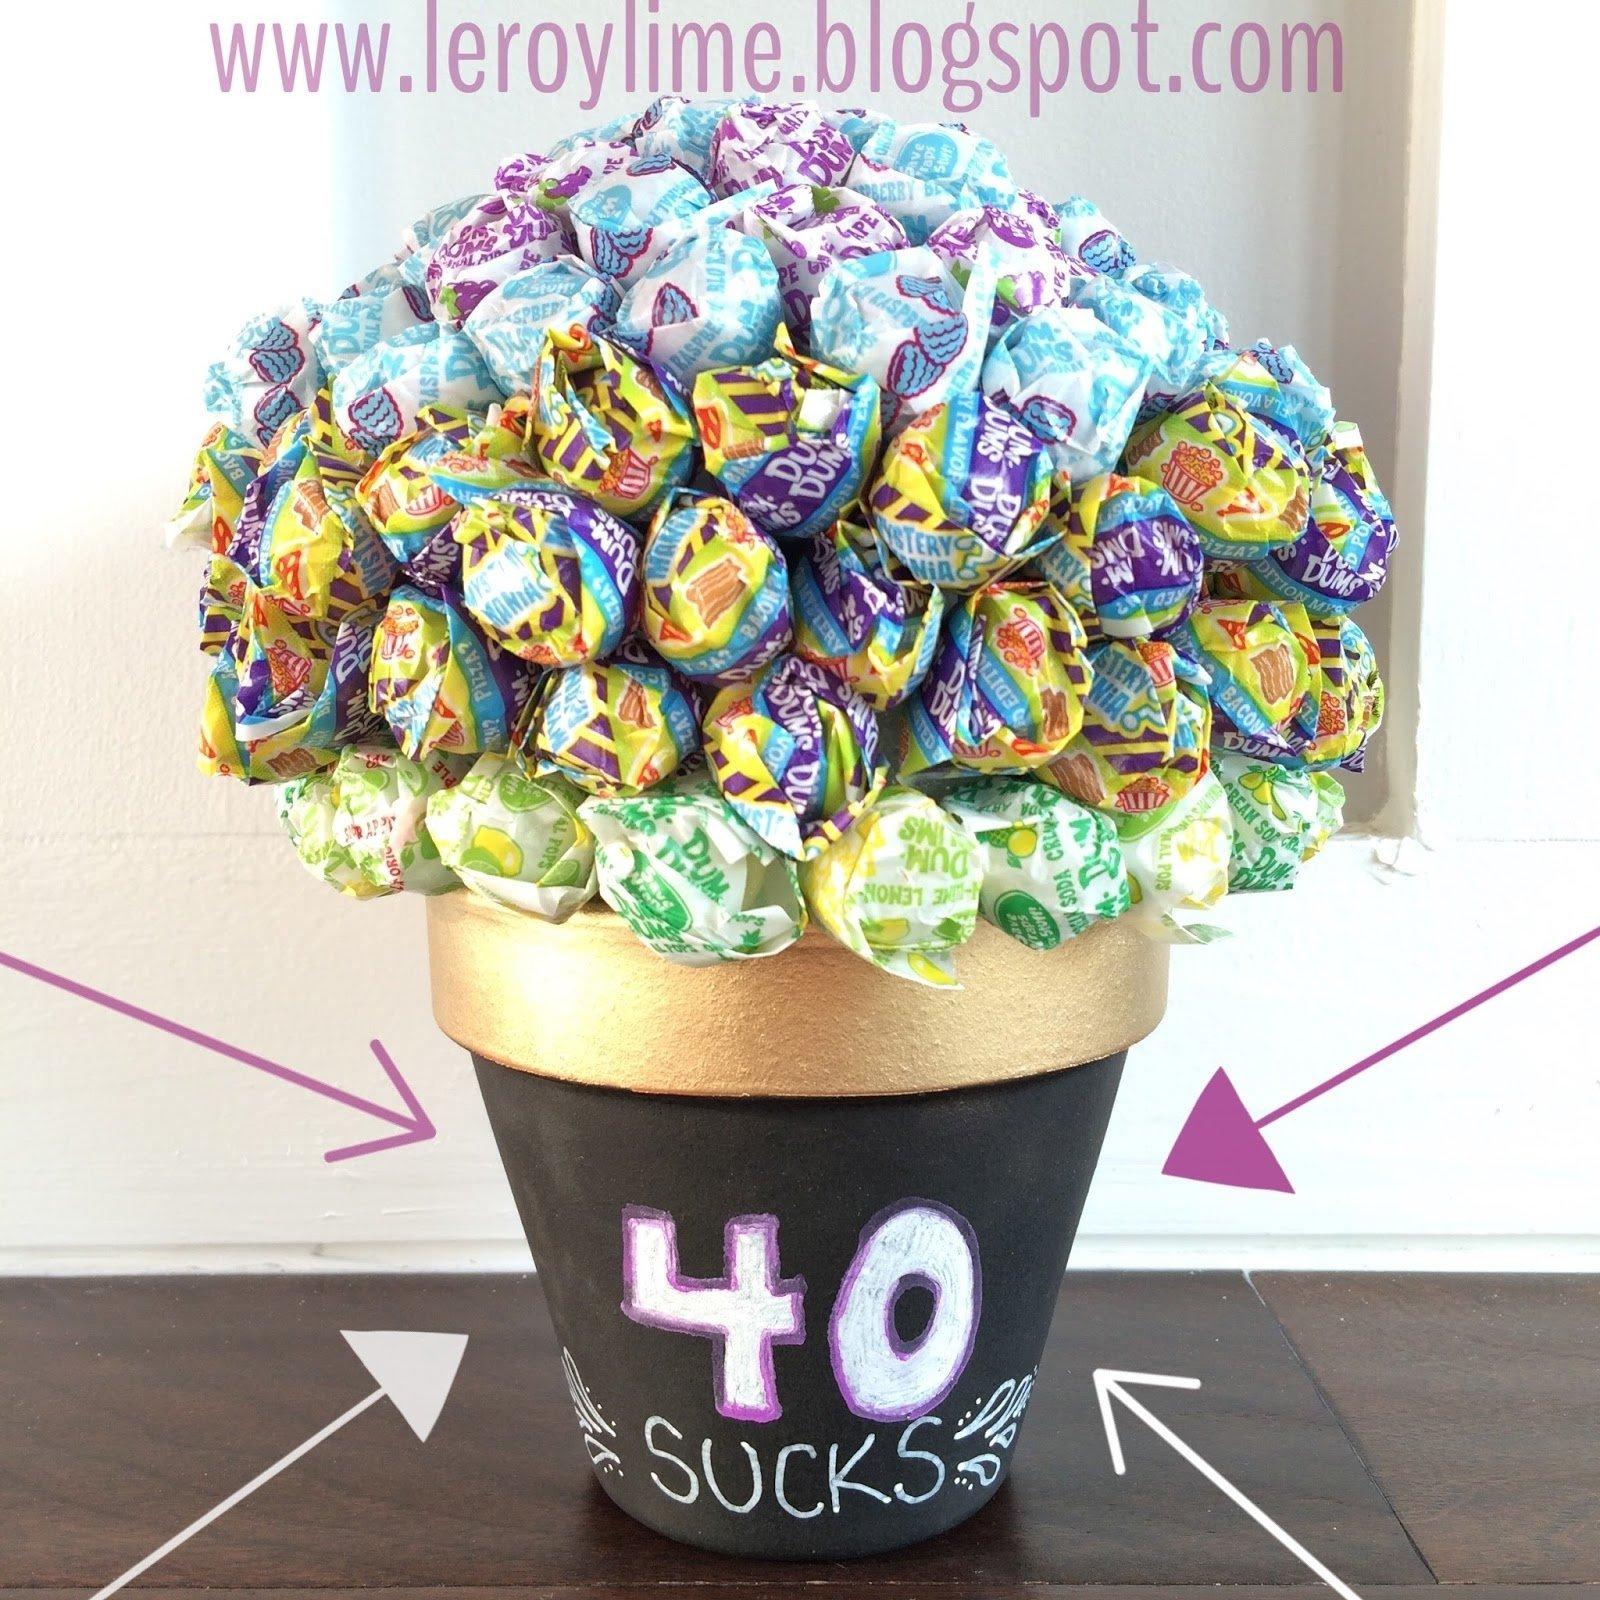 10 Stylish 40 Birthday Gift Ideas For Her leroylime 40th birthday gift idea 5 2020